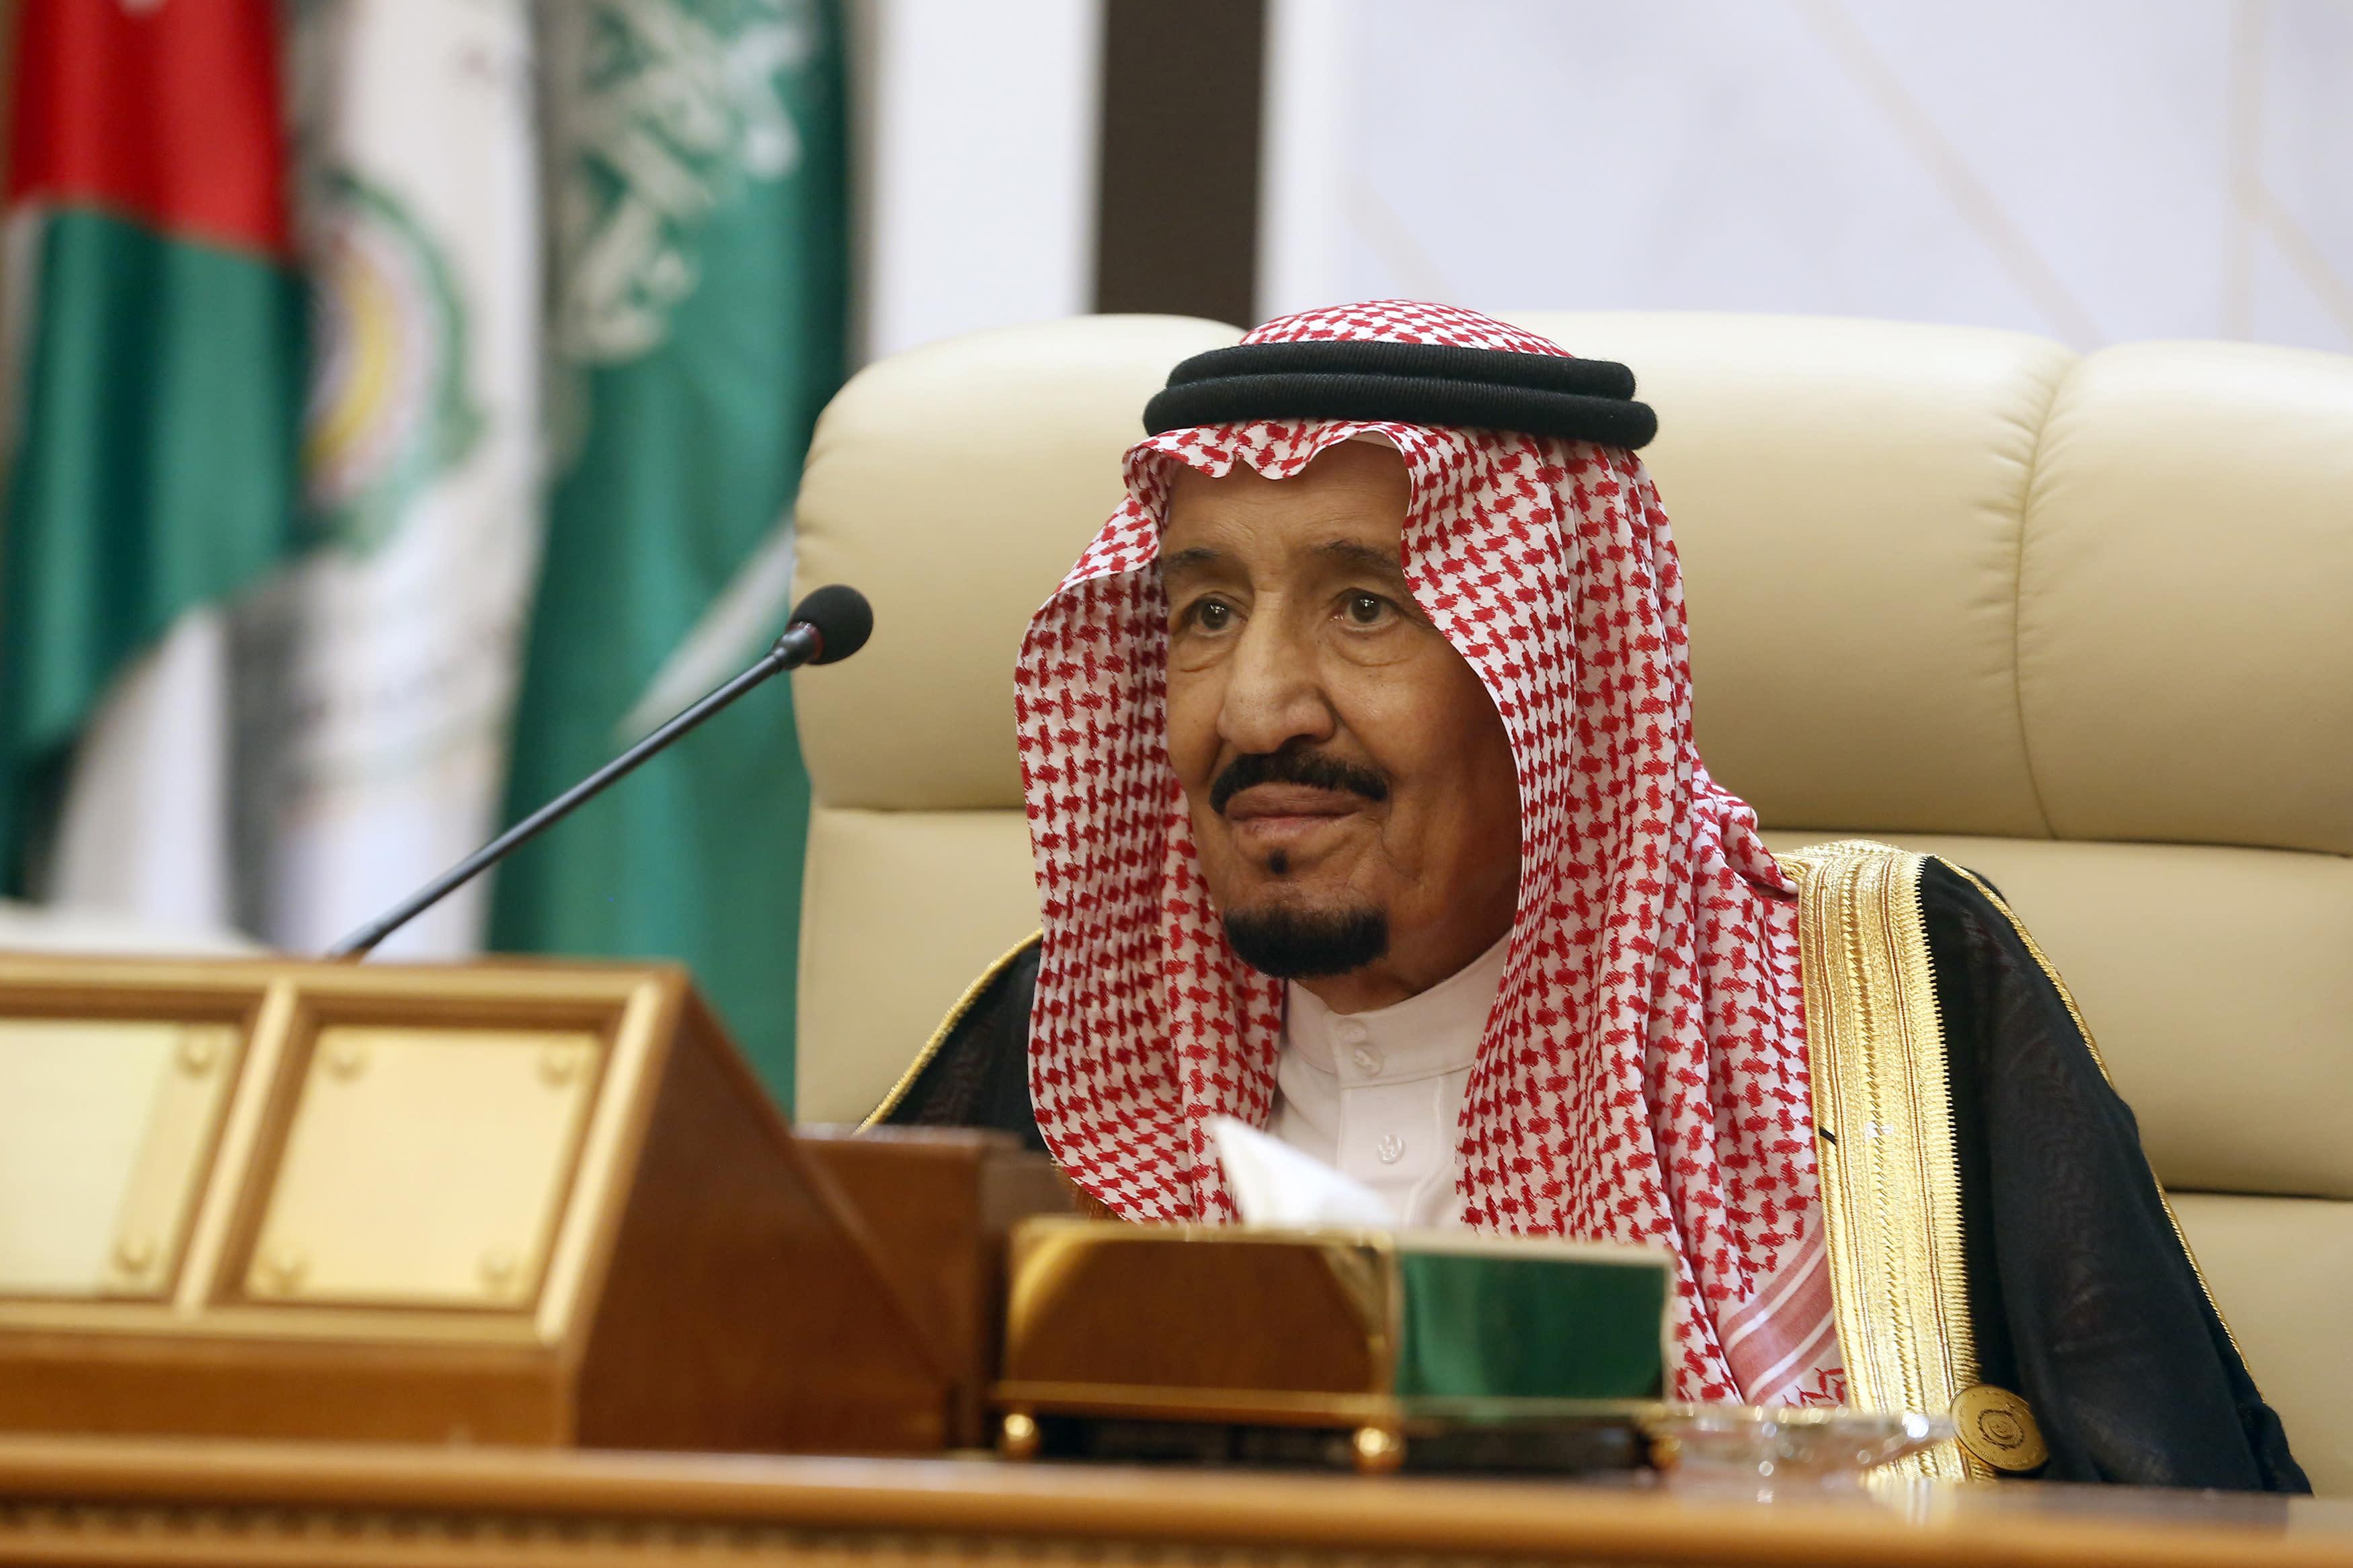 Saudi King Salman's bodyguard shot dead